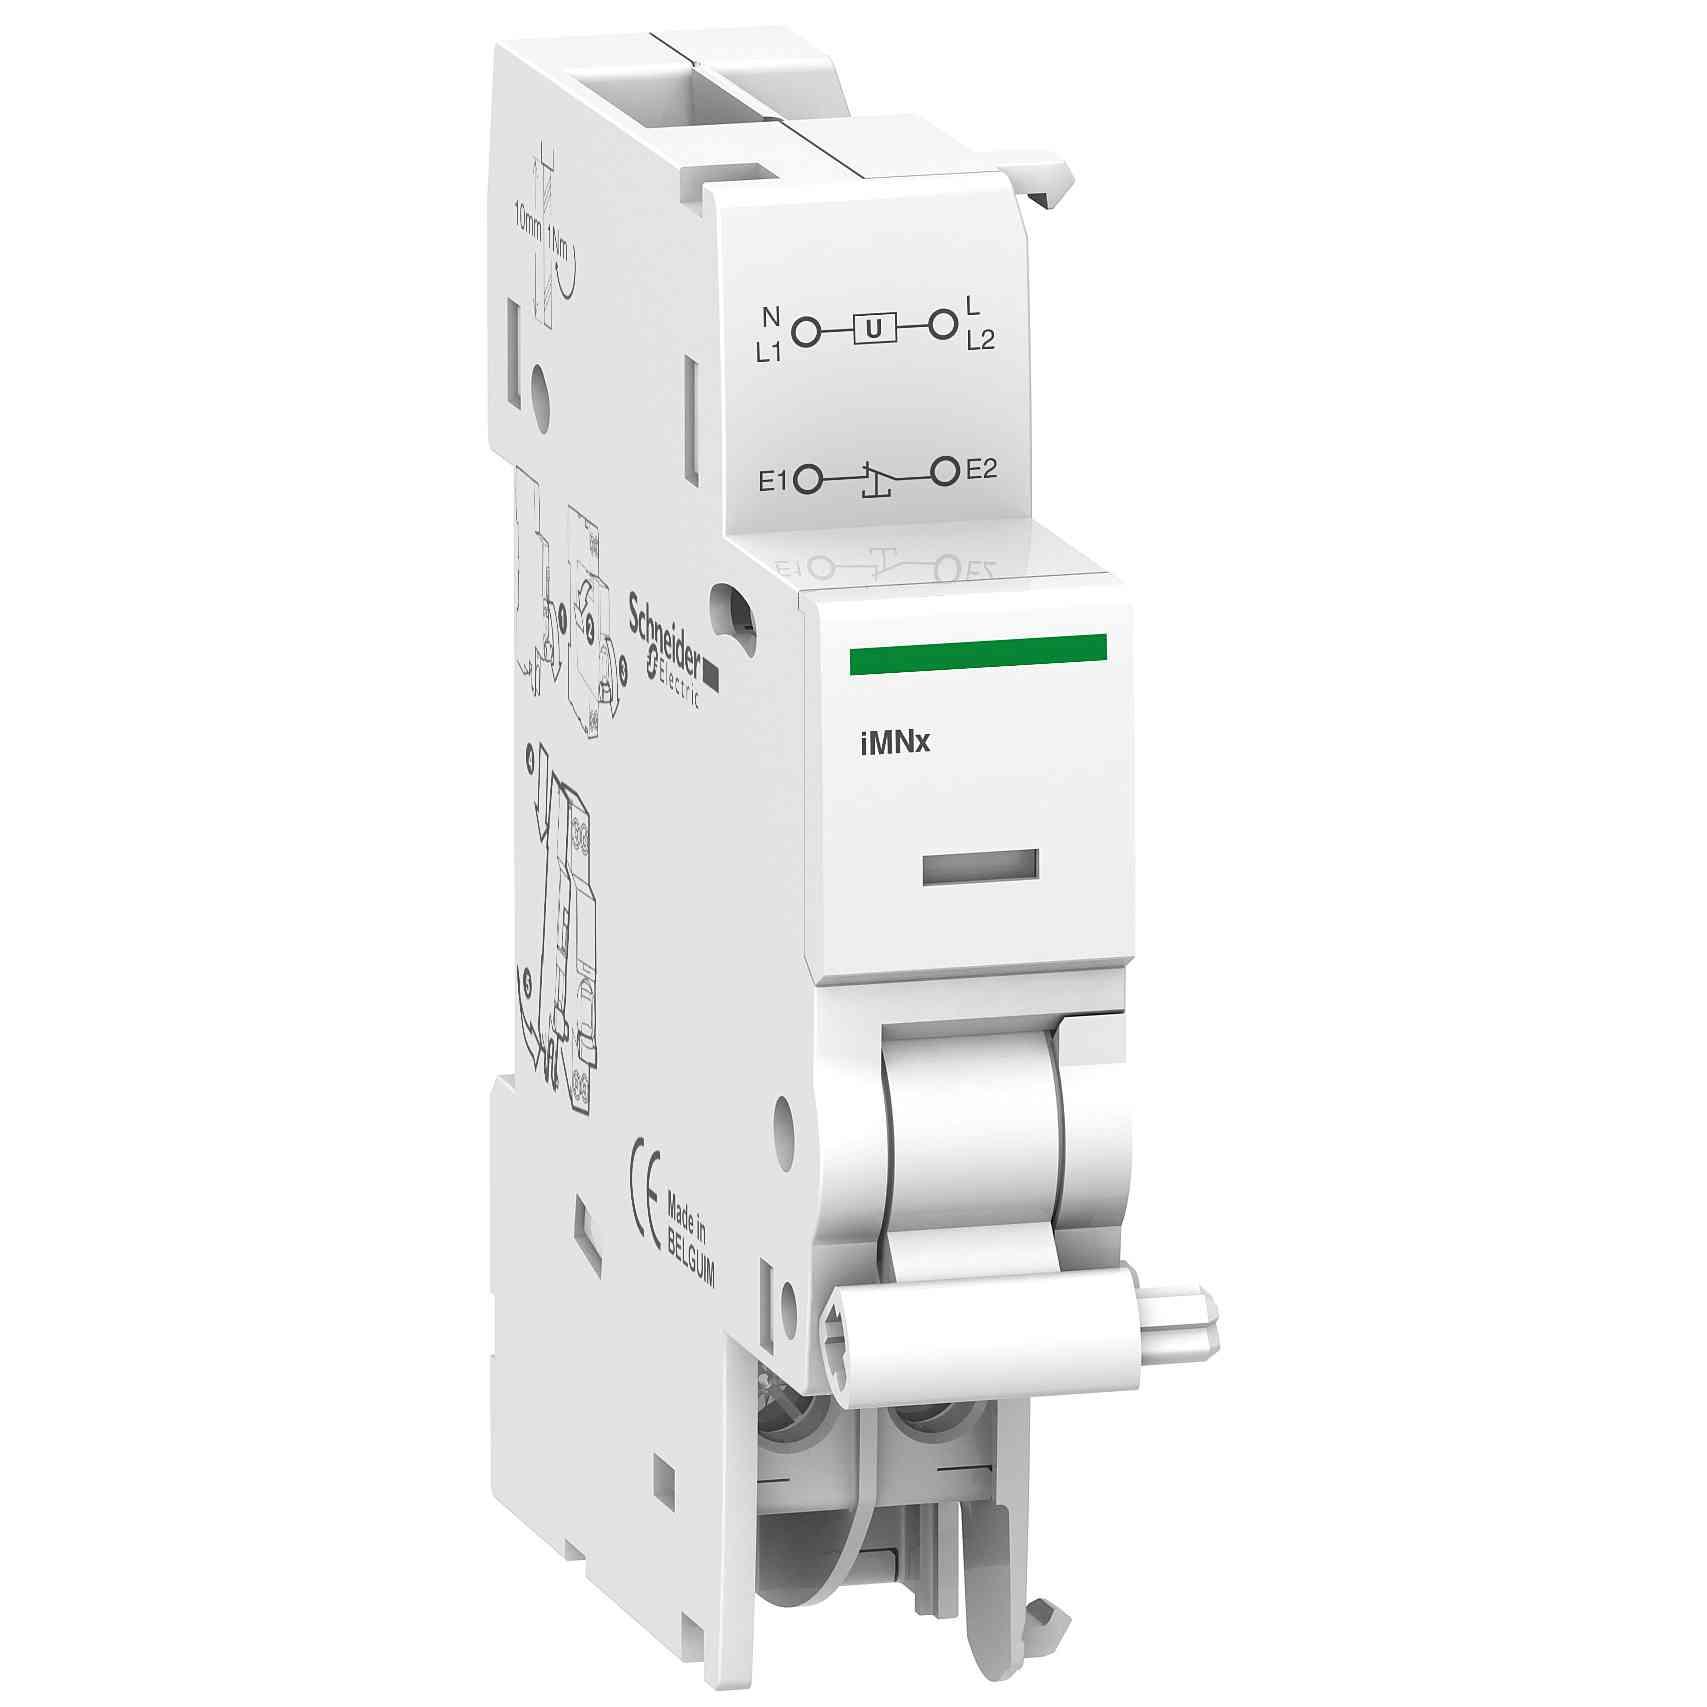 Podnap. prož. - iMNx - sprožna enota - 380 do 415 V AC